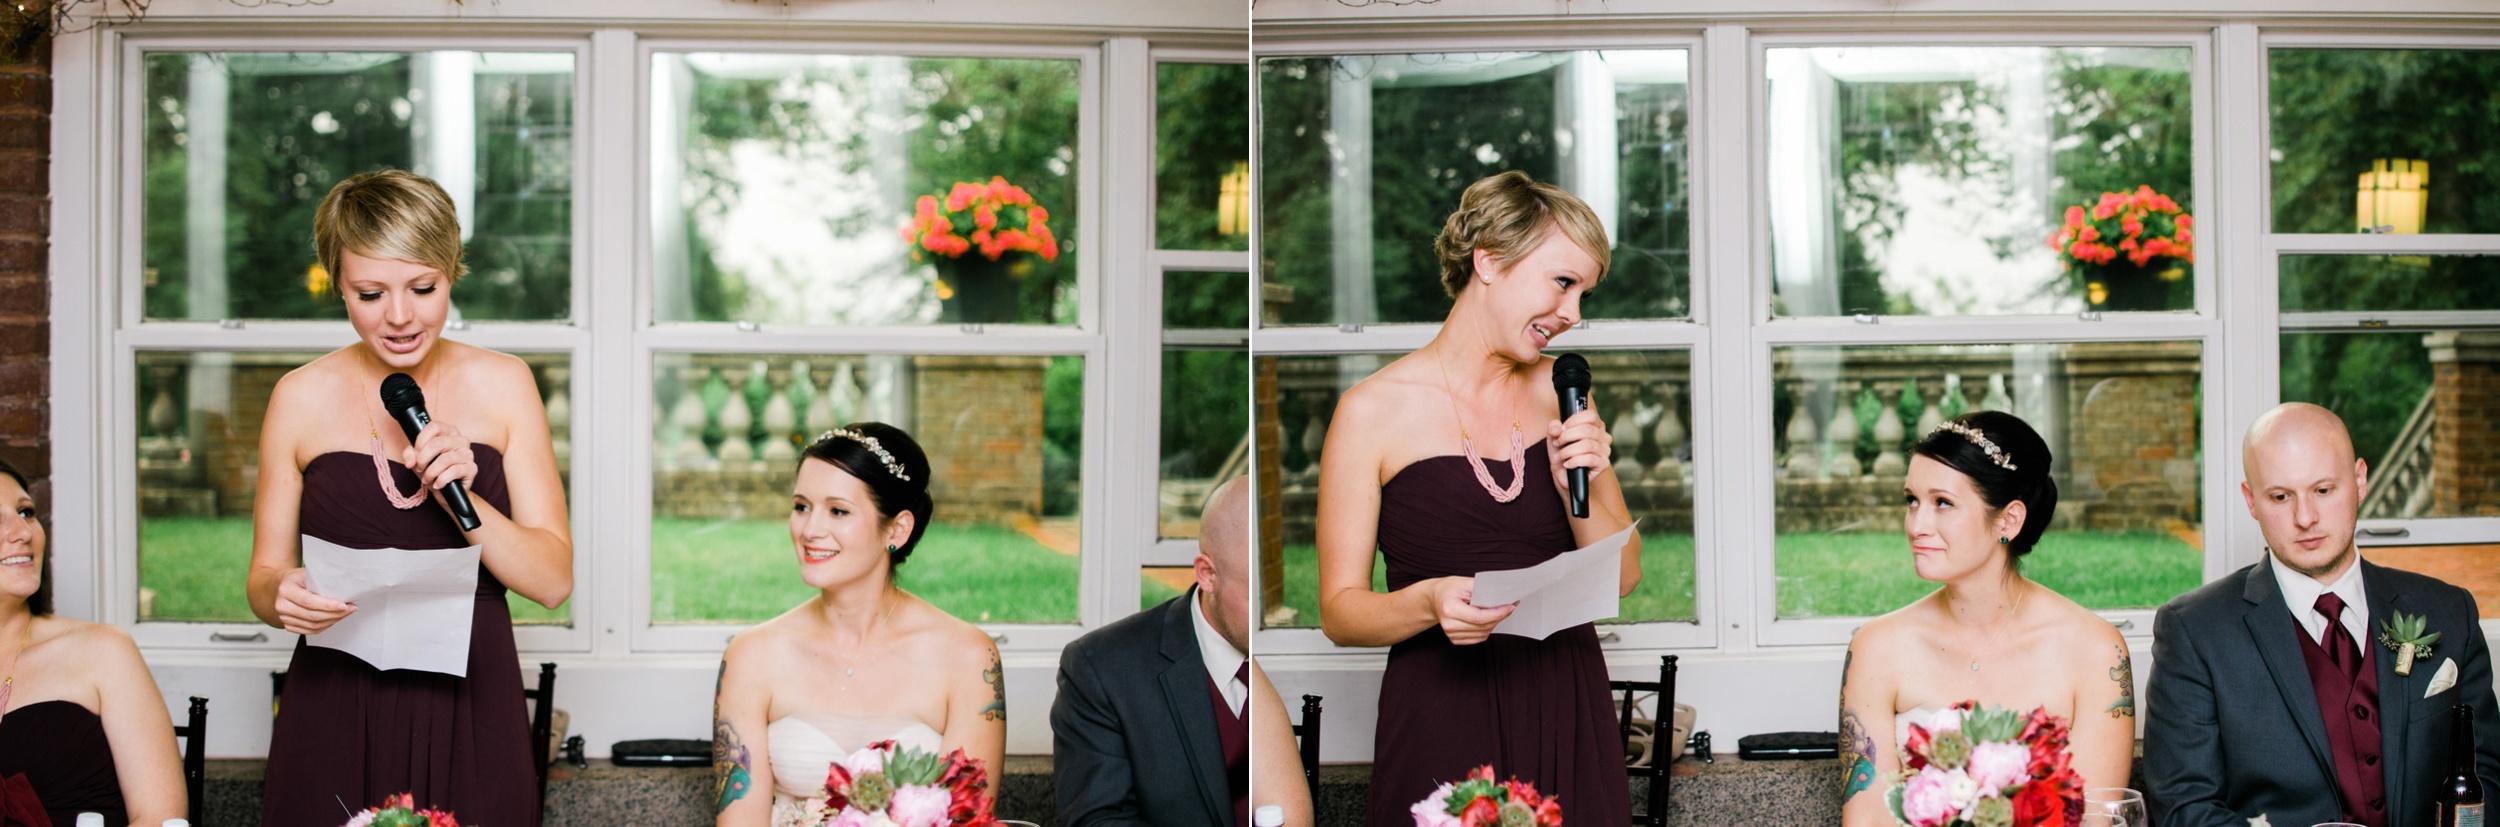 Glensheen Mansion Wedding | Duluth, MN Wedding Photographer_0519.jpg